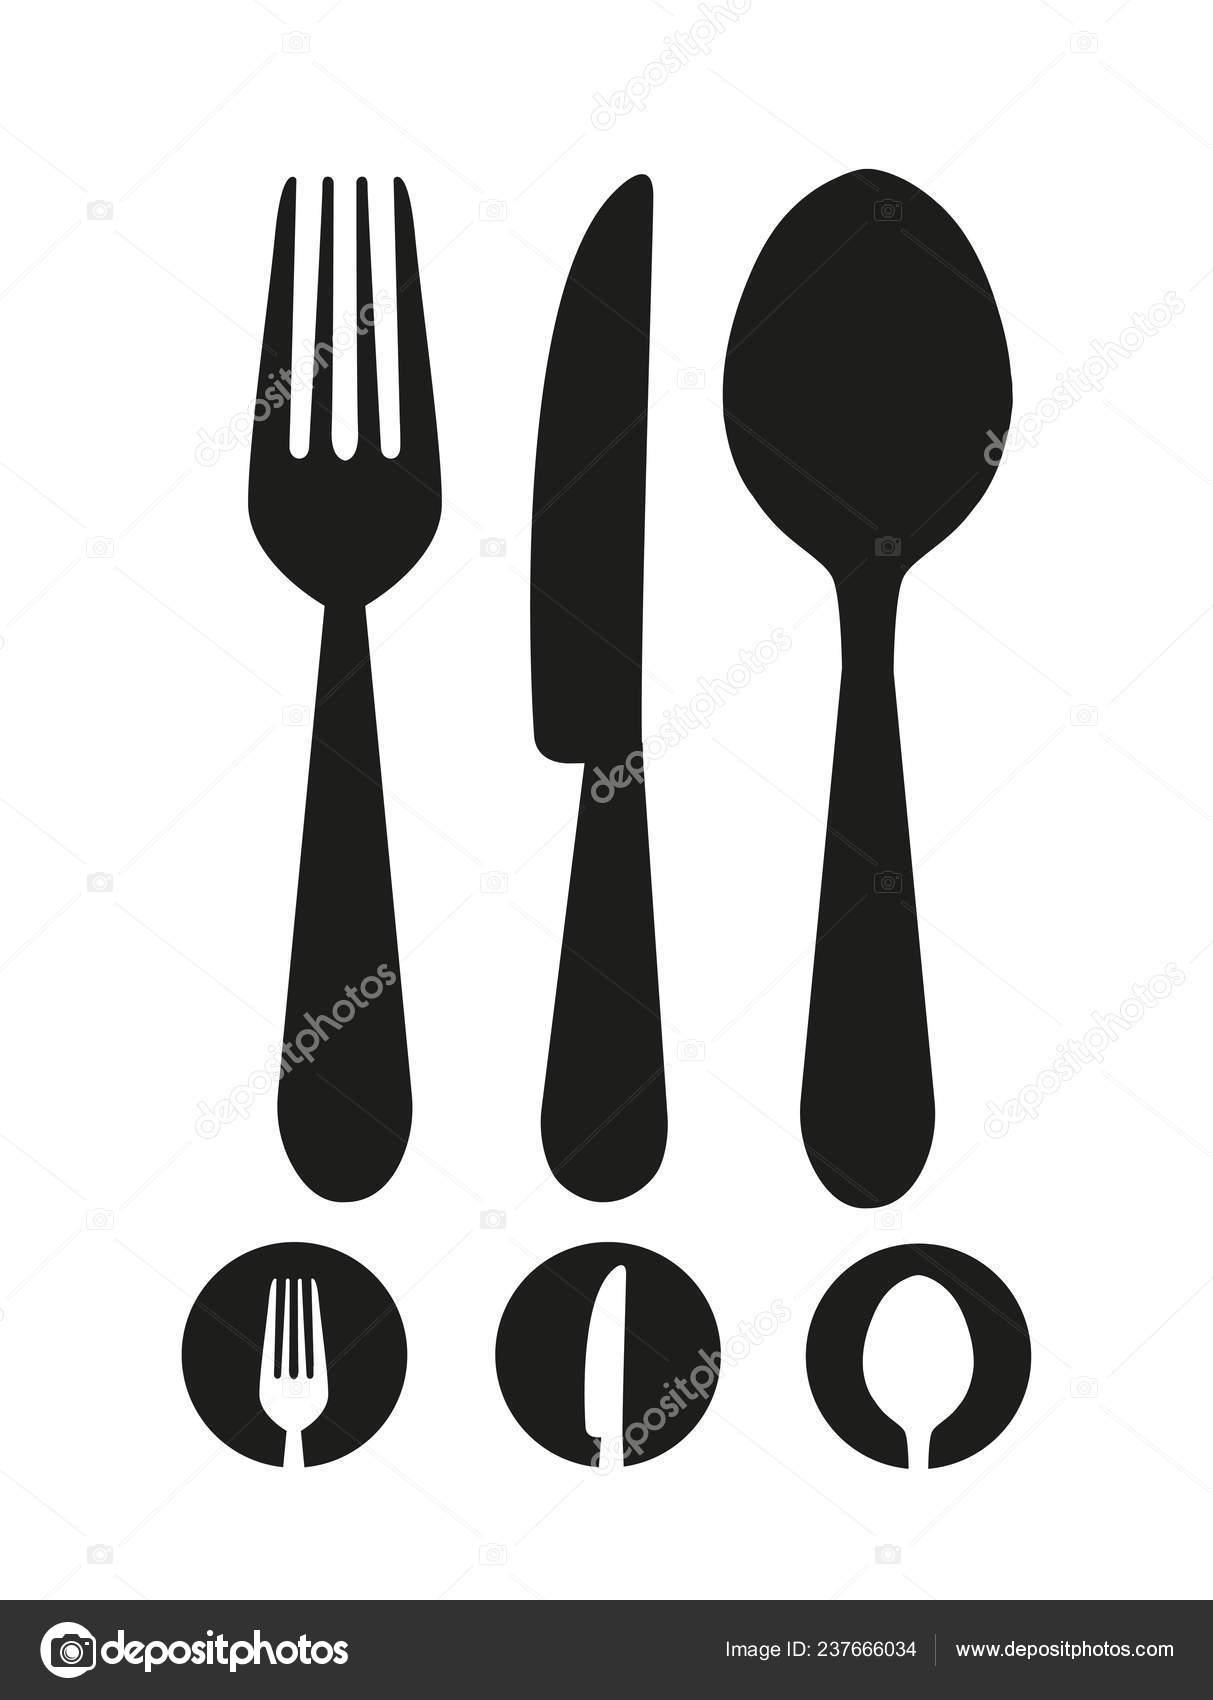 knife fork spoon icon vector stock vector c 4zeva 237666034 https depositphotos com 237666034 stock illustration knife fork spoon icon vector html